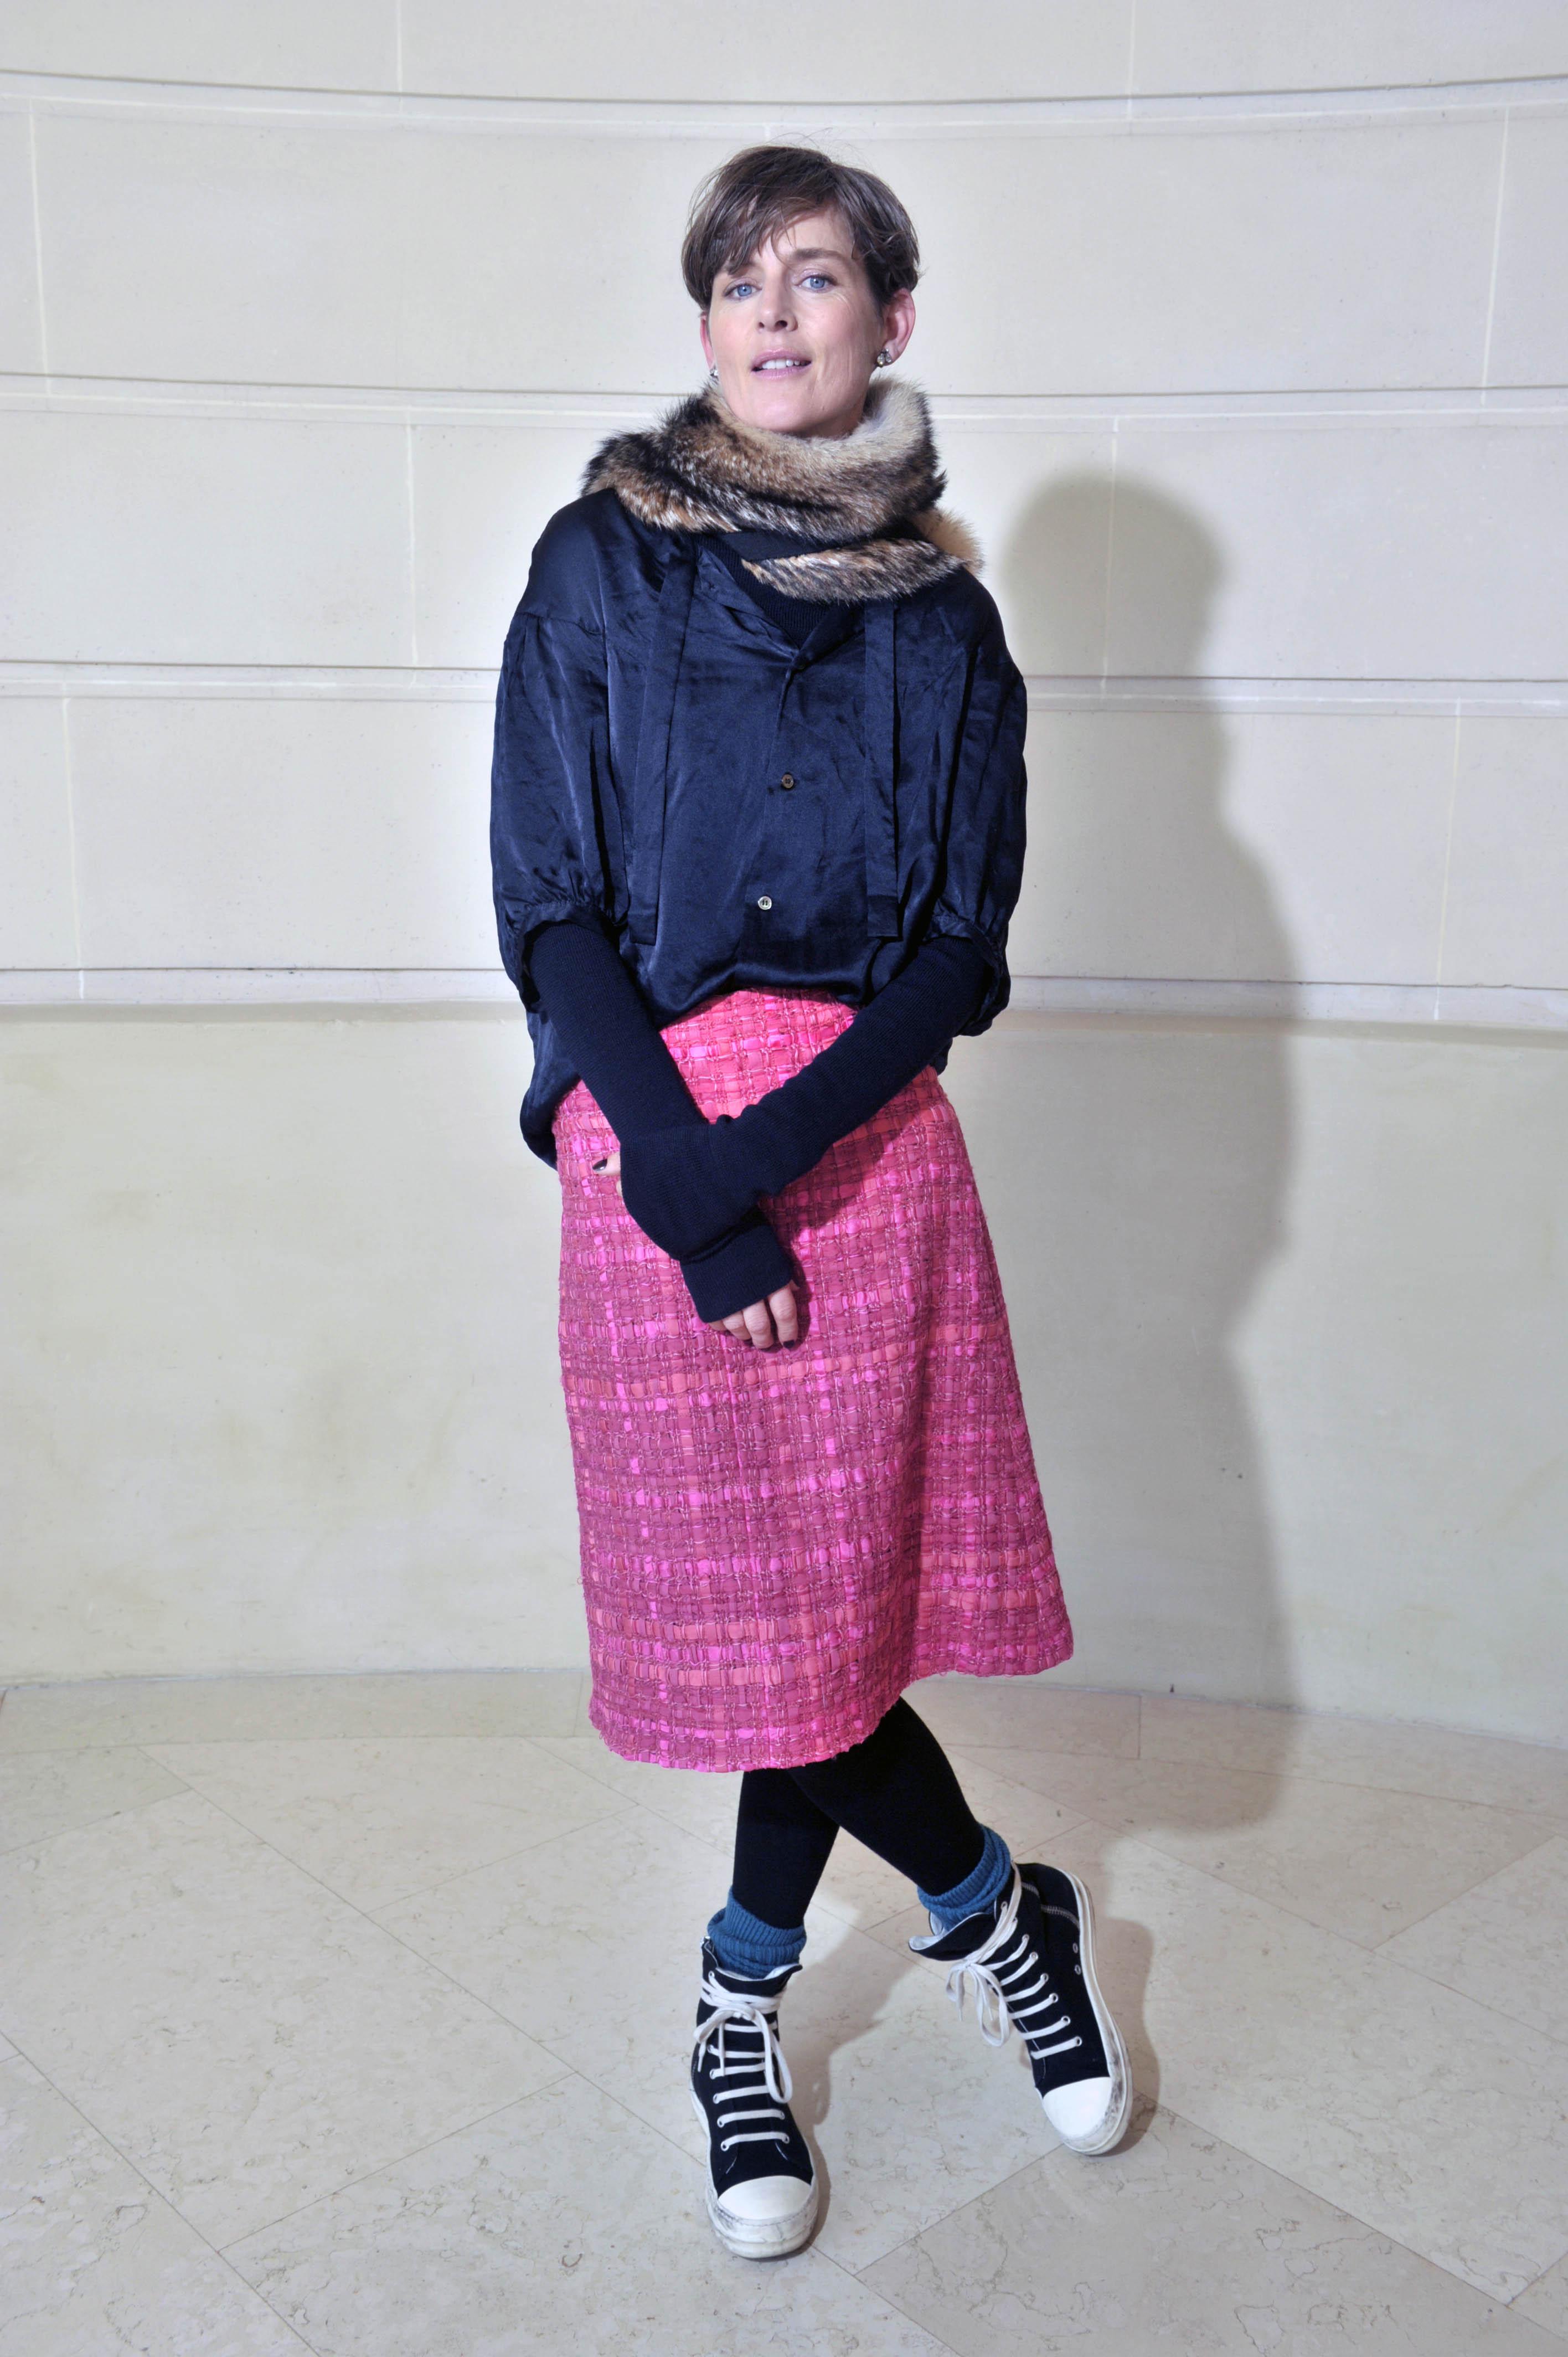 Stella Tennant Chanel Métiers d'Art Show at the Ritz Paris